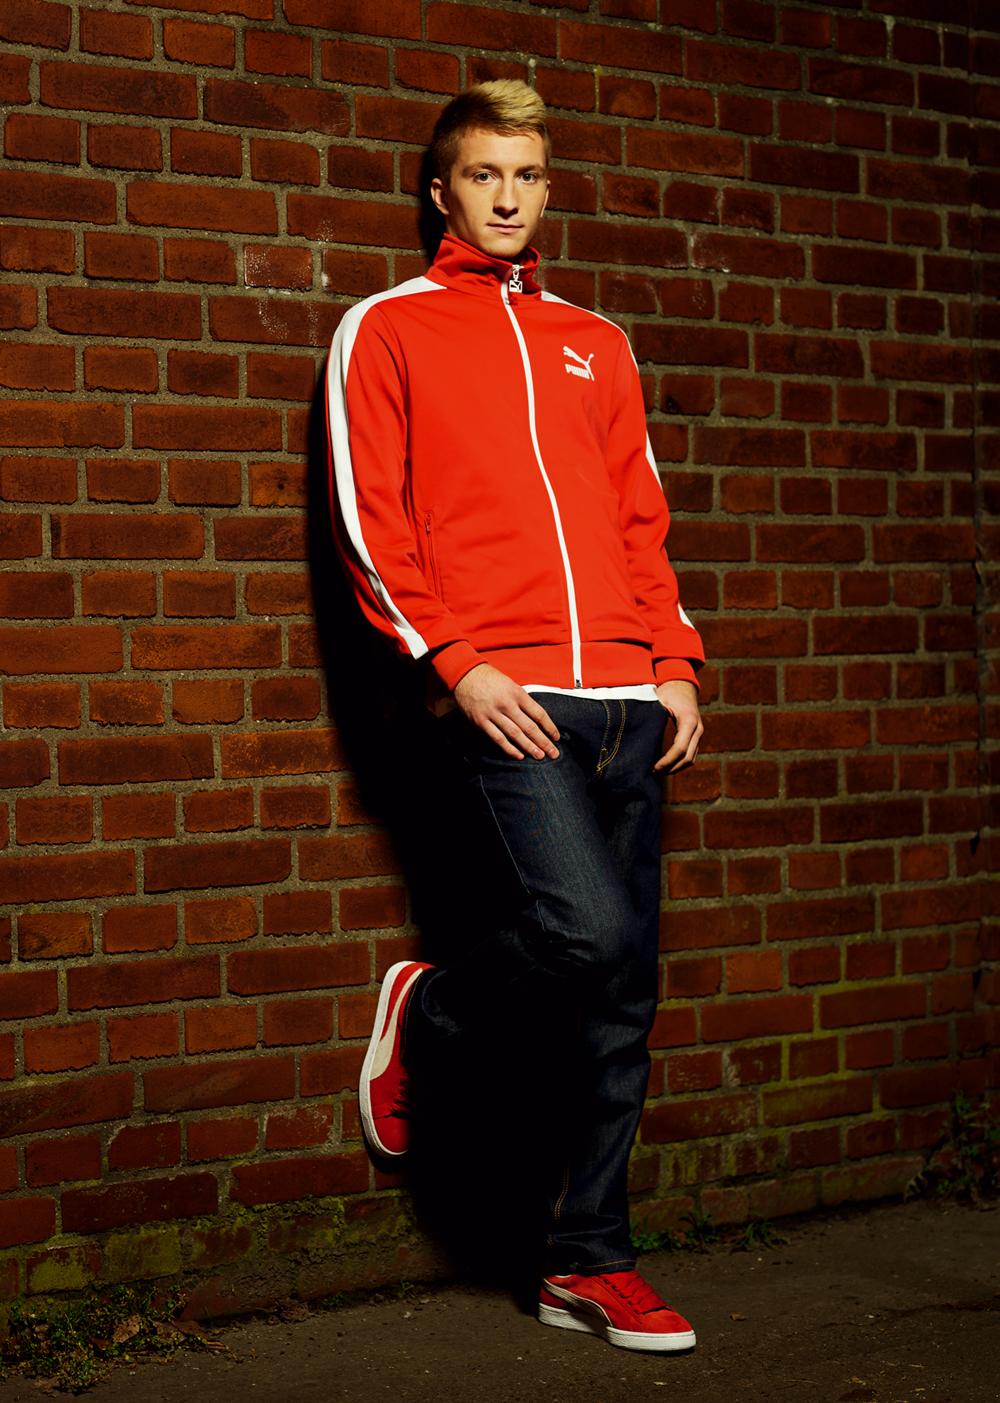 Marco Reus on Rx 8